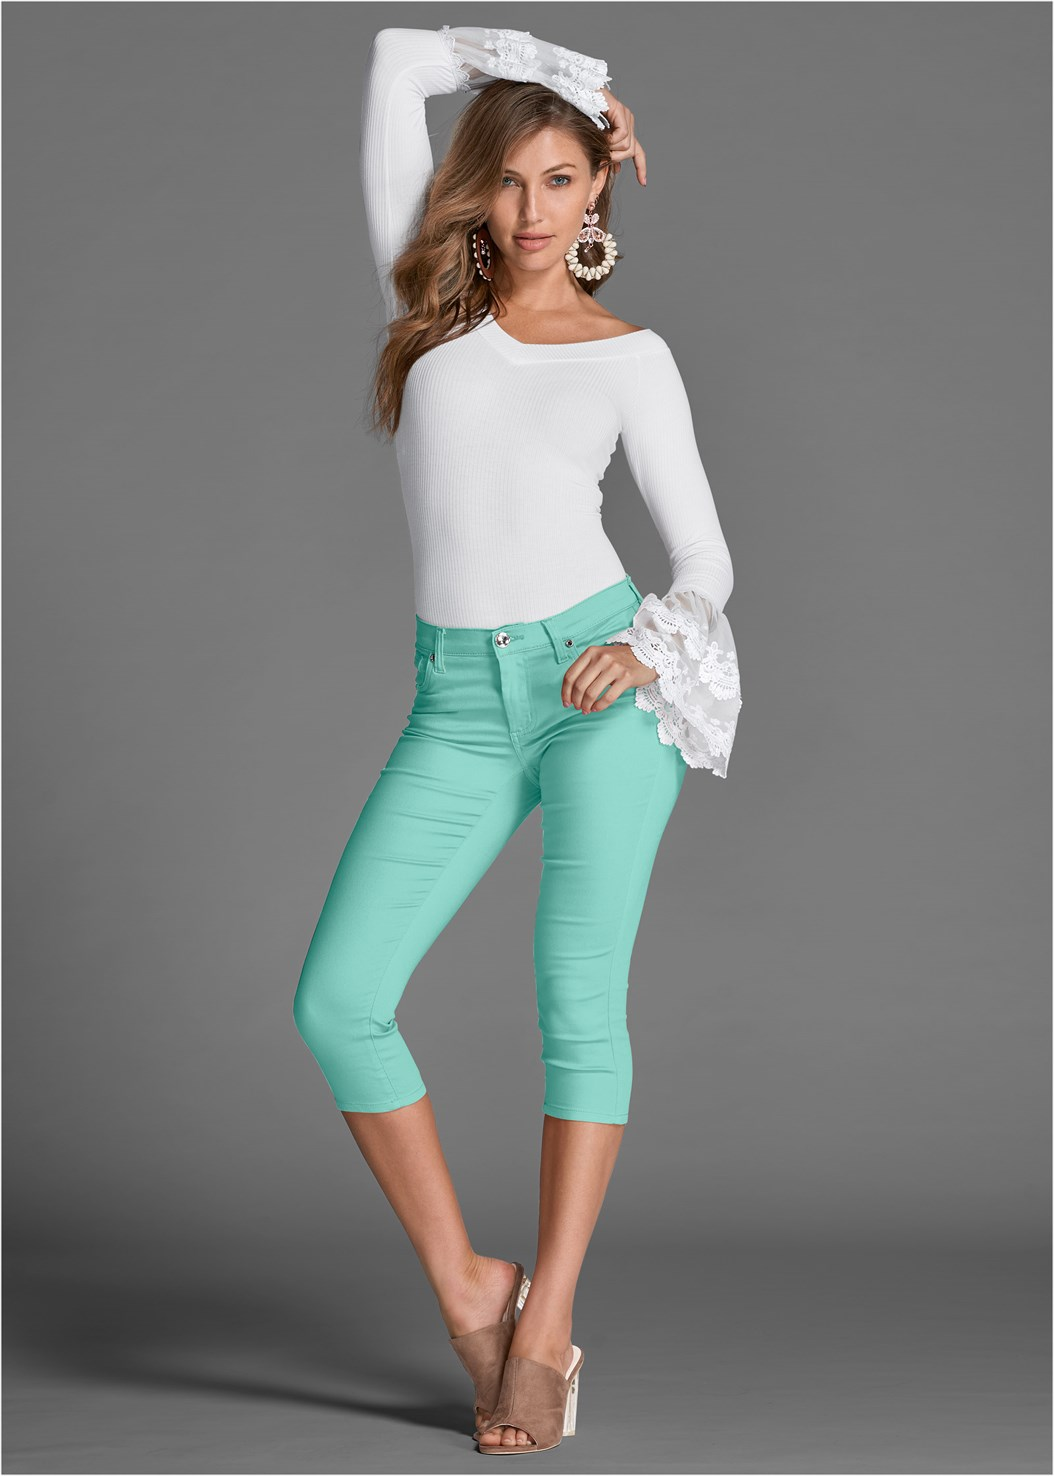 Color Capri Jean,Deep Cuff Jeans